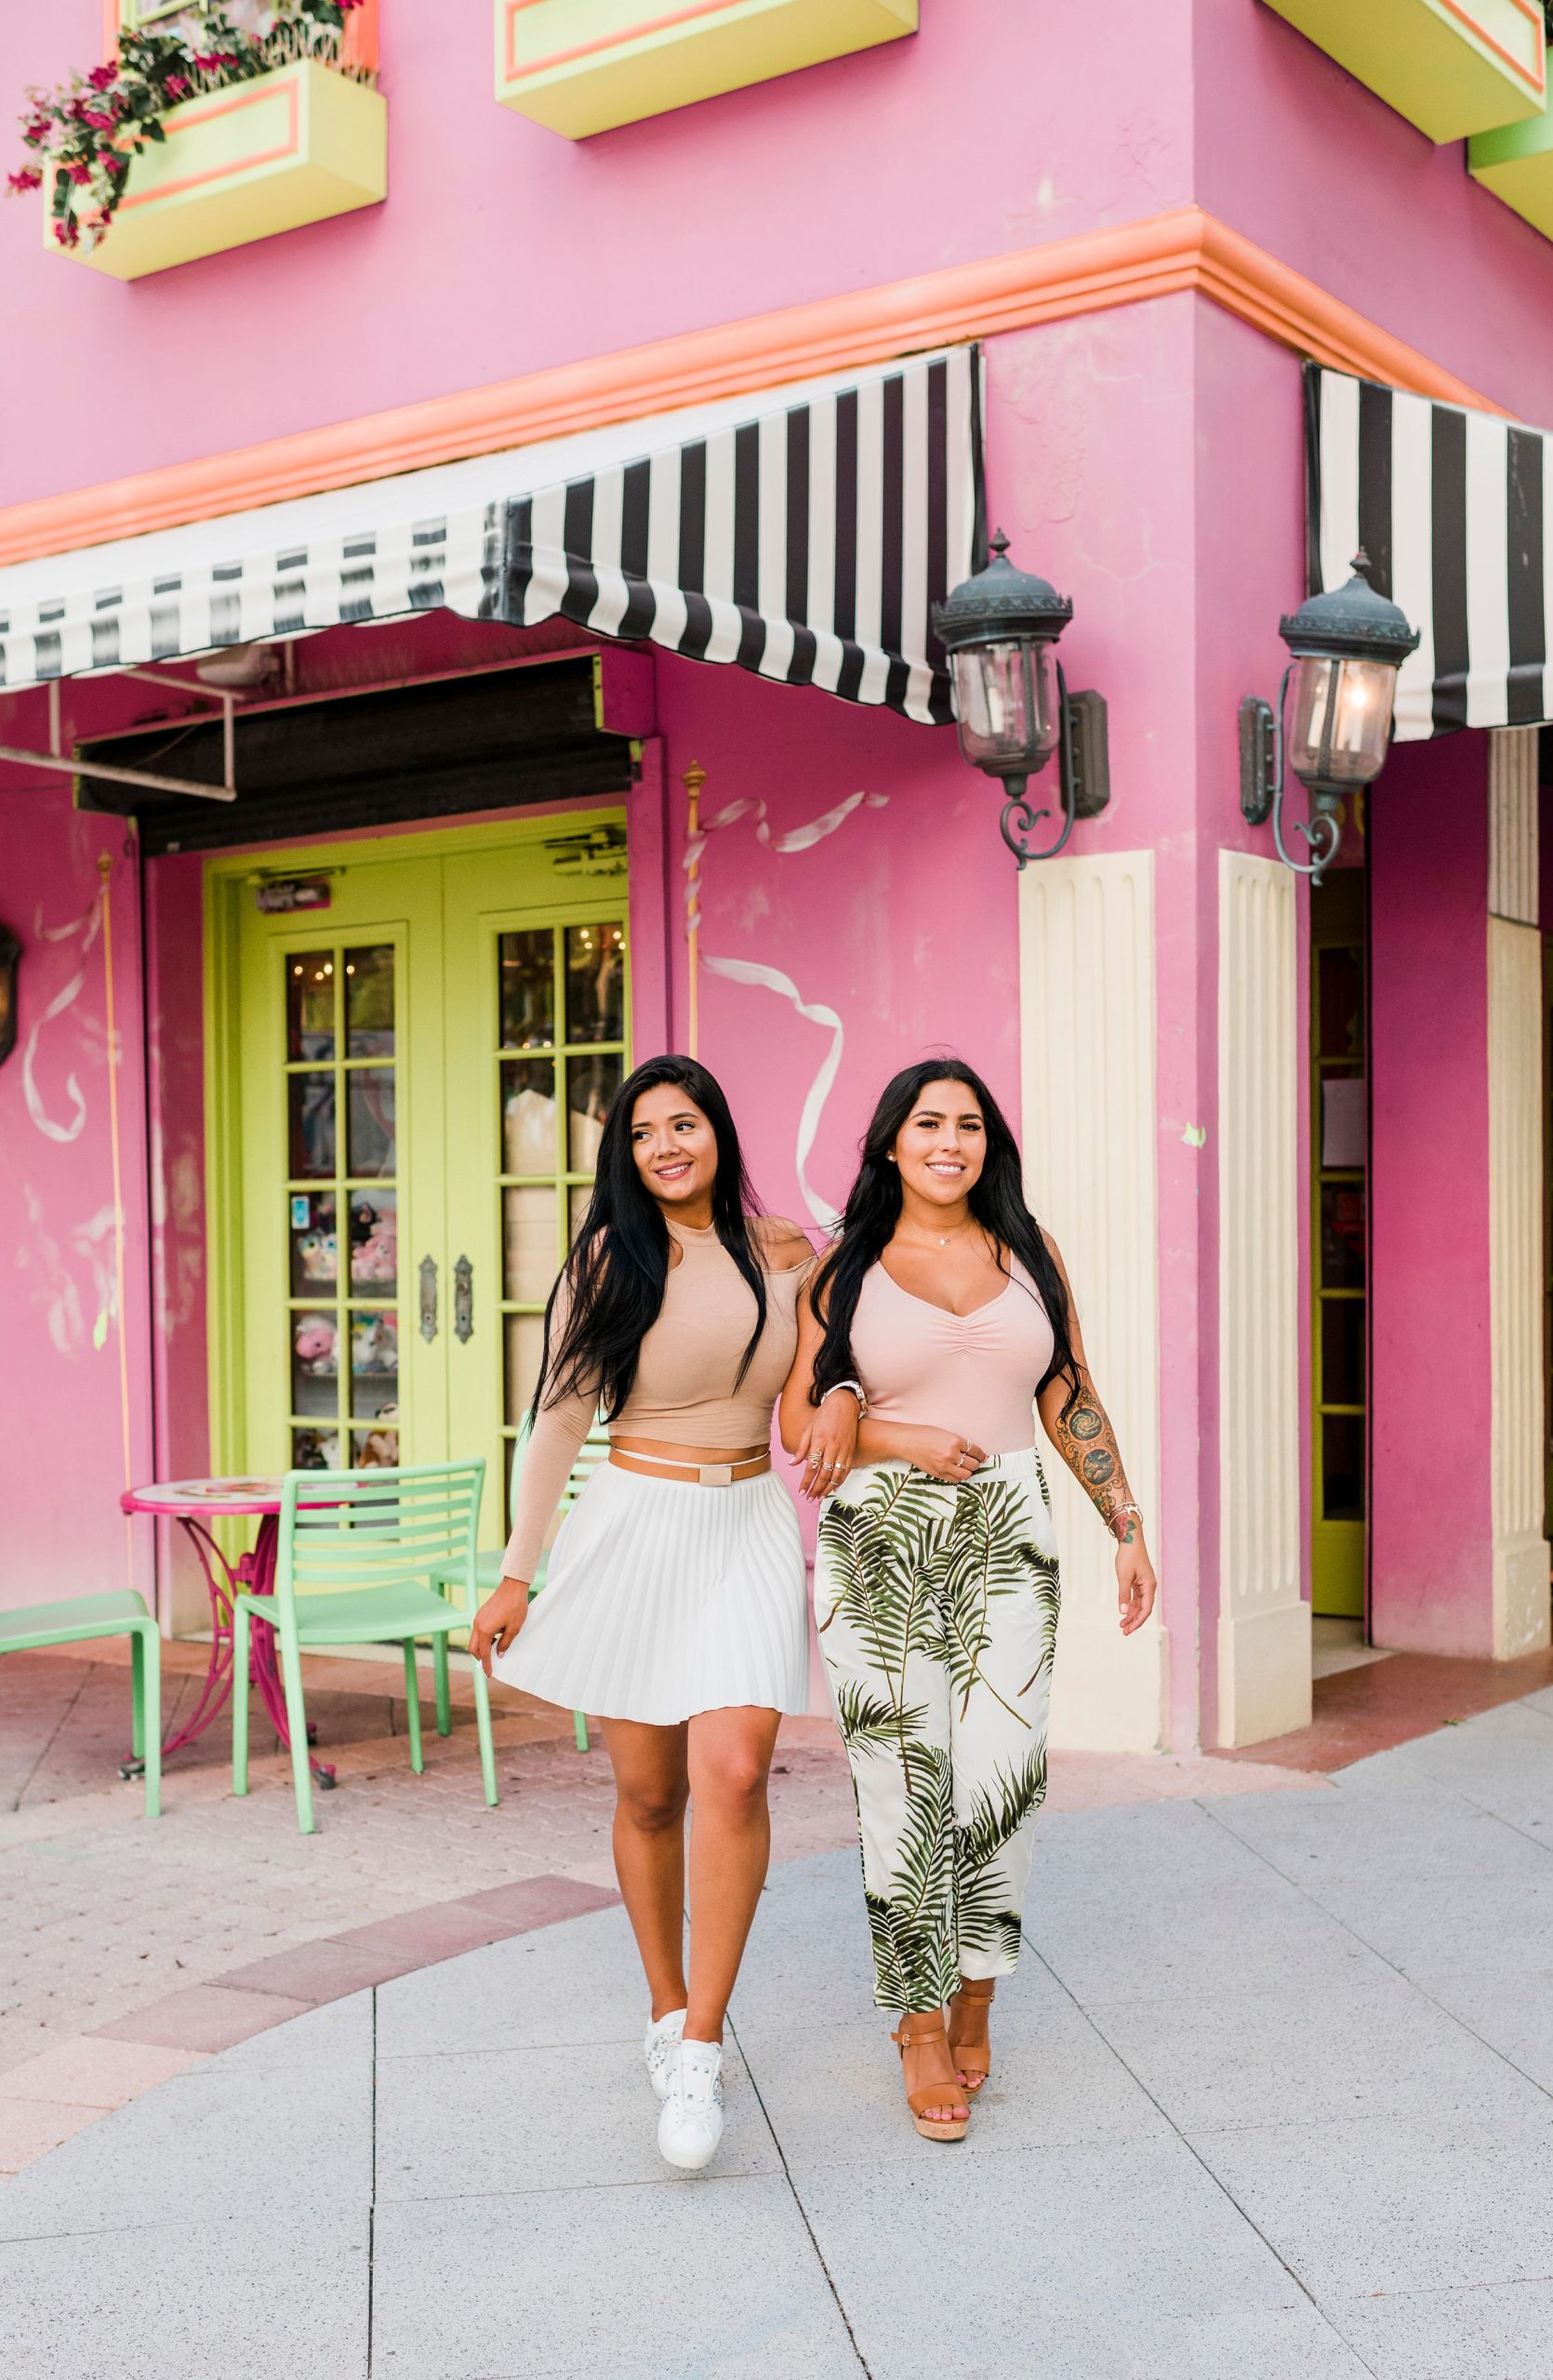 Palm Beach Lash Artists - Maybelle Beauty Bar